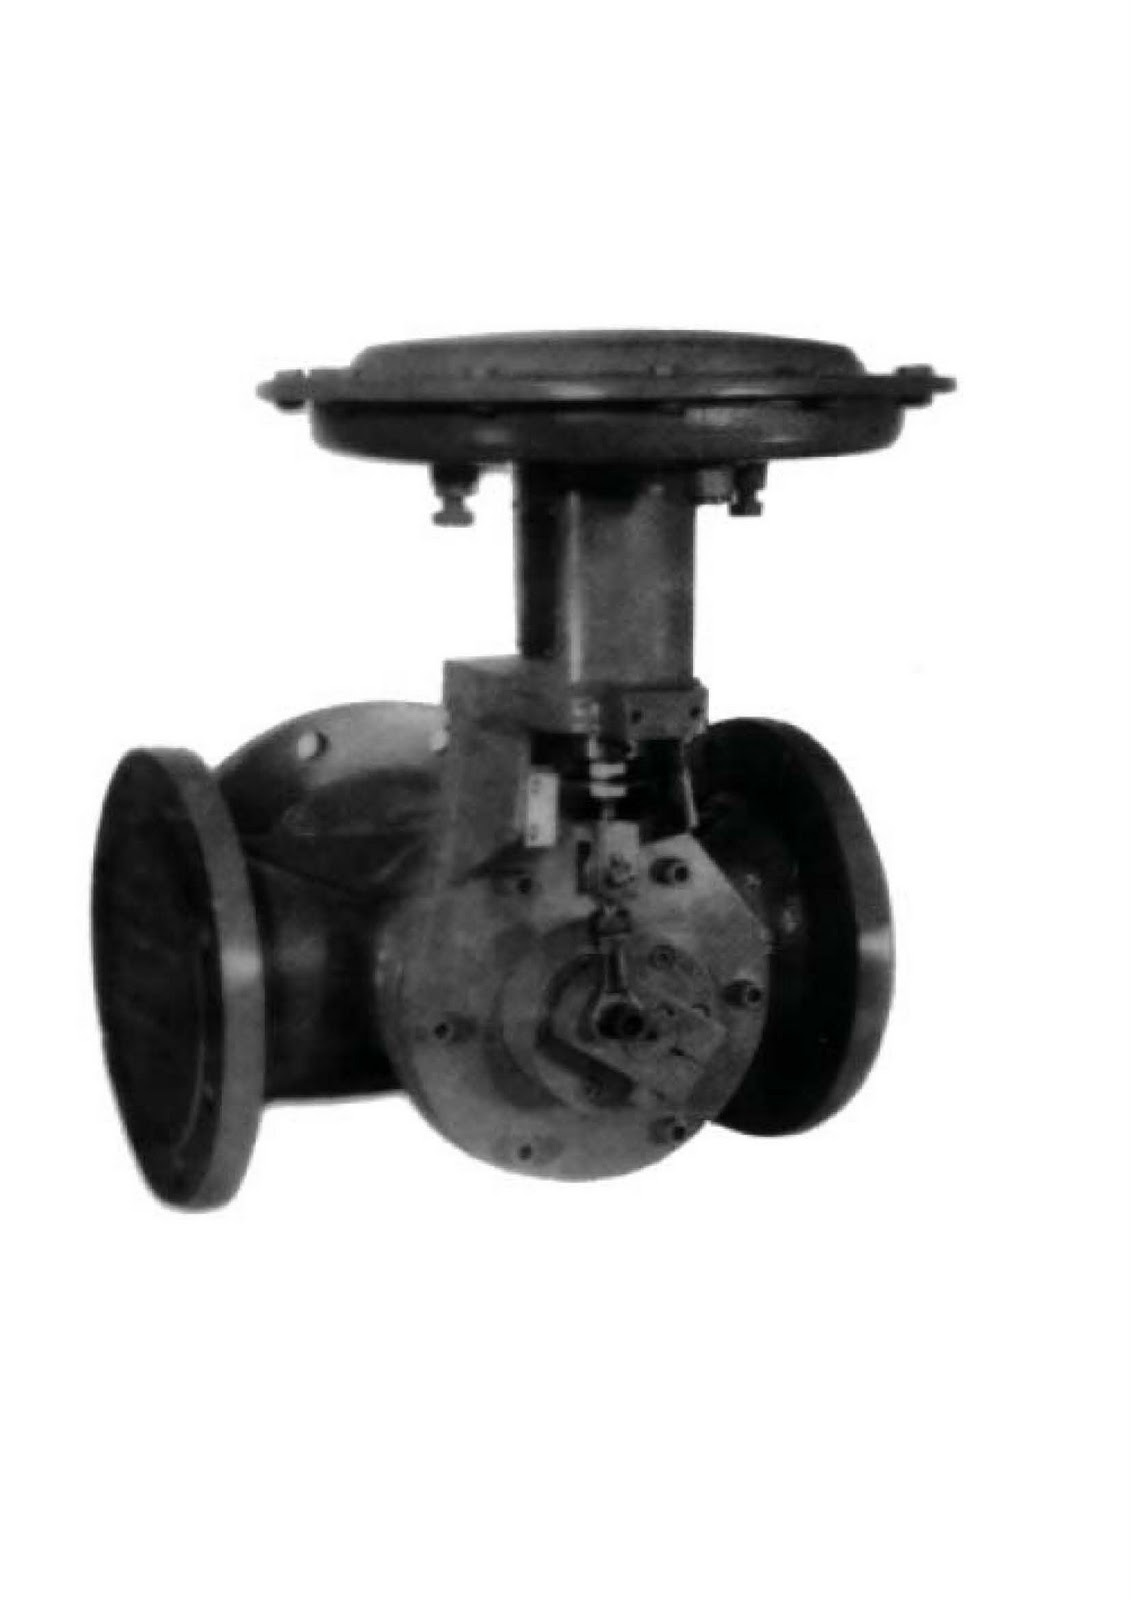 vaasa  thailand  limited  control valves   spriano   mec automation